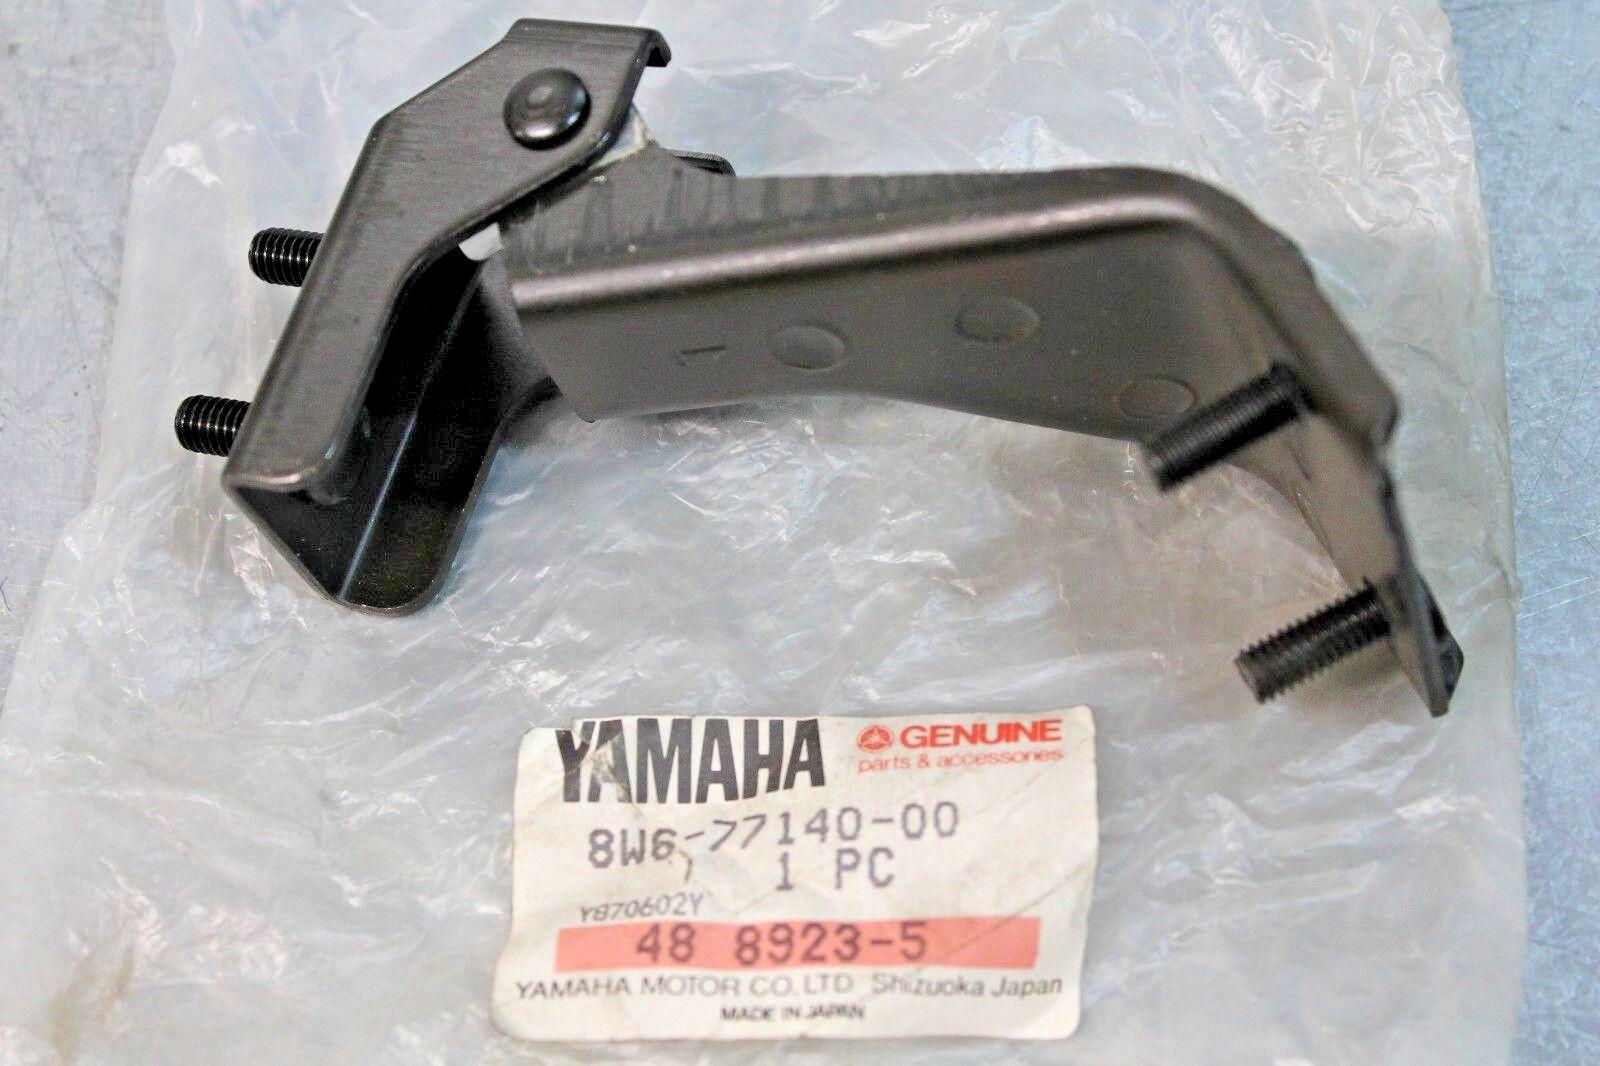 OEM 1984 - 1990 Yamaha SNOWMOBILE Shroud Windshield Hinge Assembly 8W6-77140-00